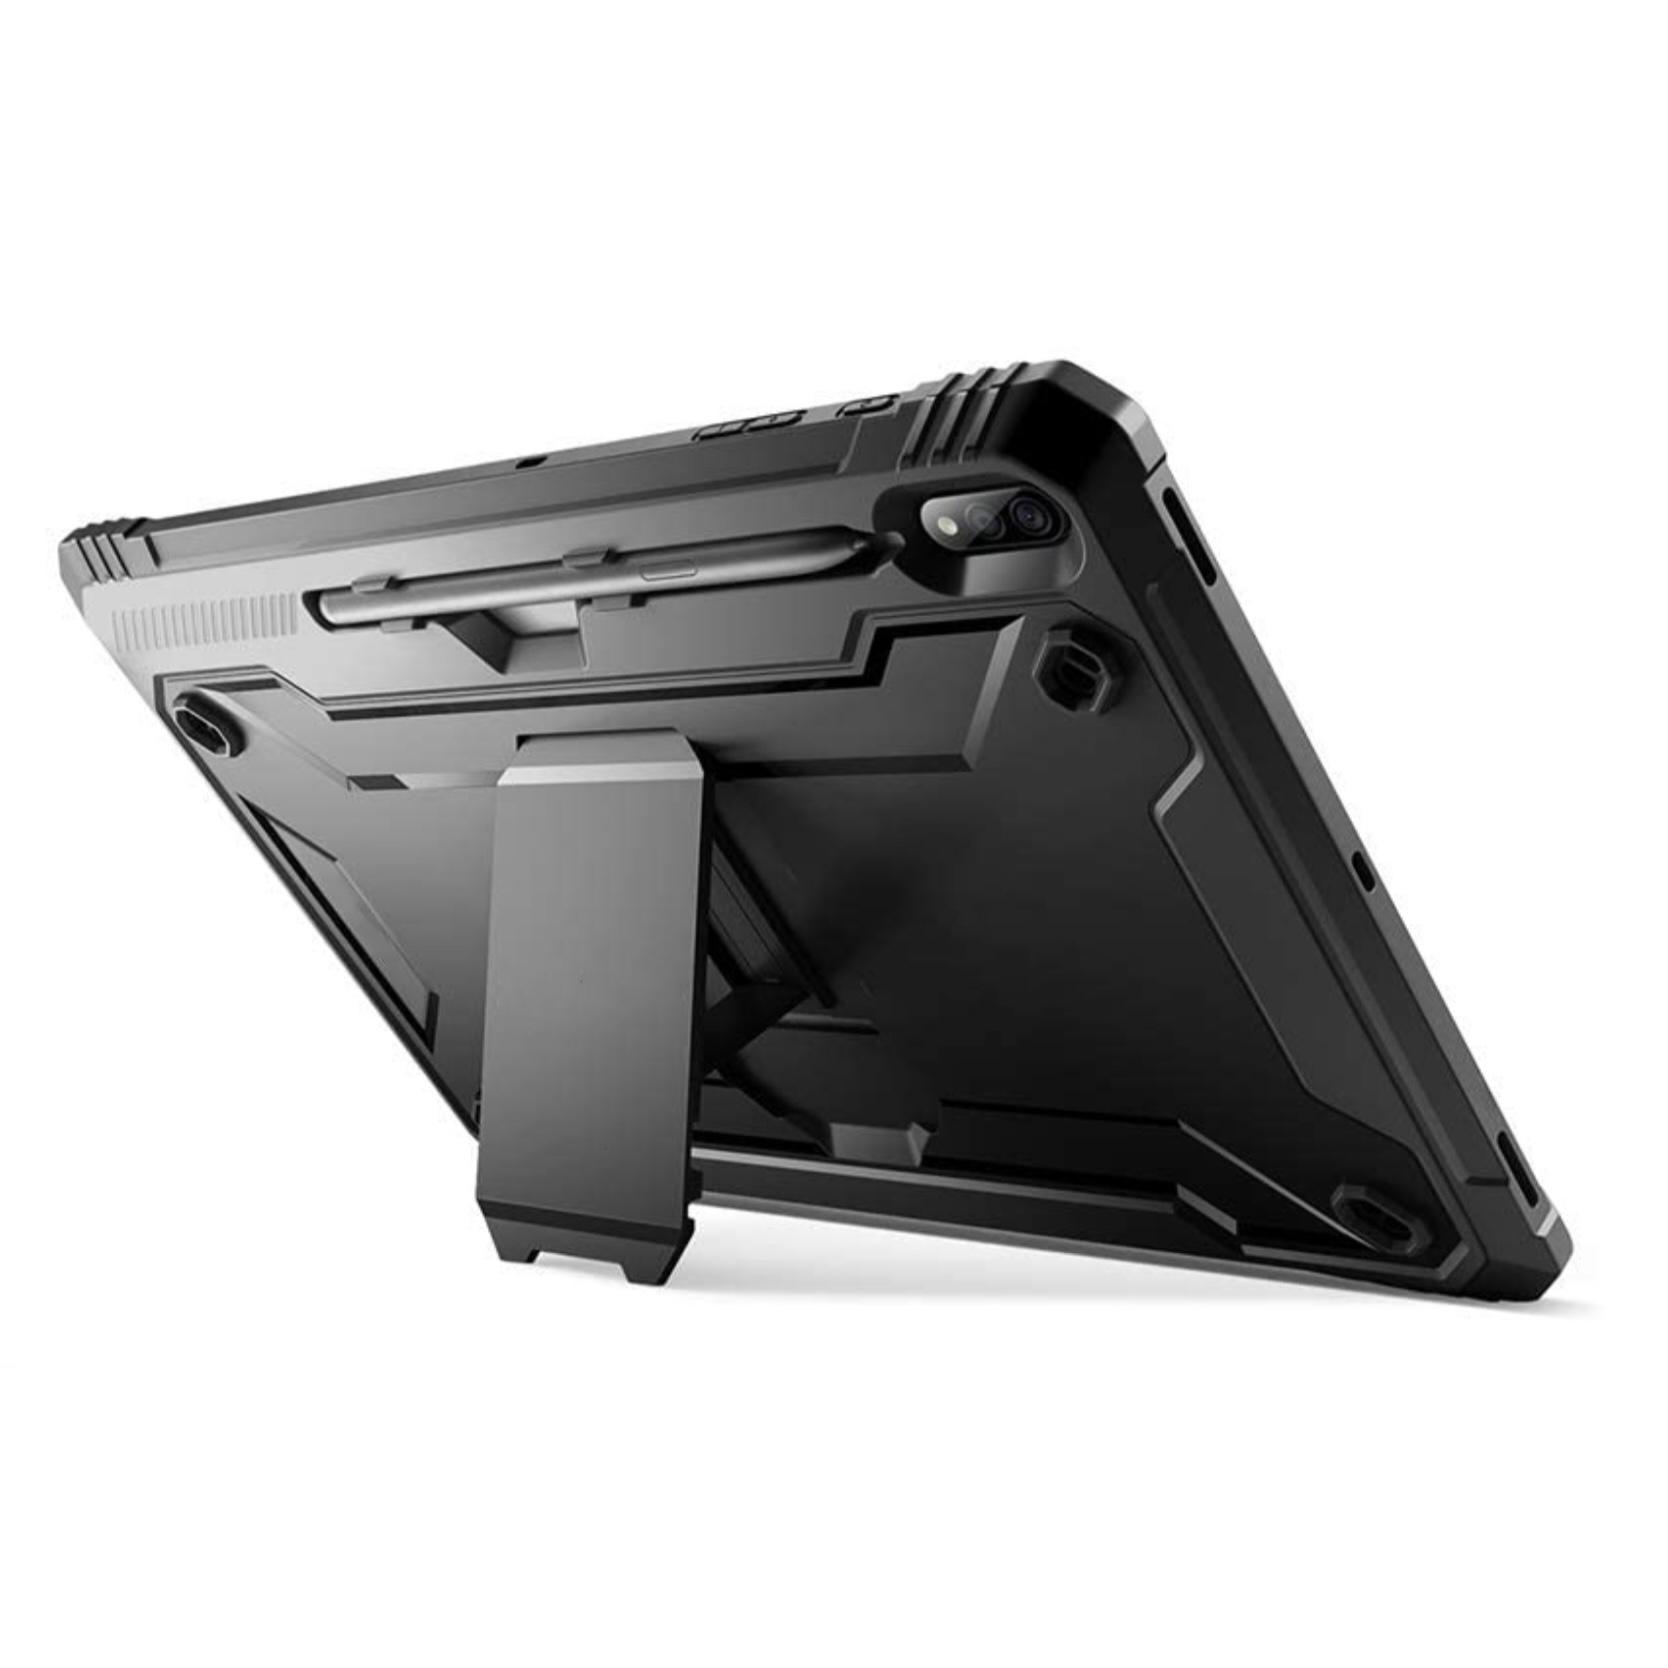 Galaxy TAB S7 Plus 12.4p Coque de Protection avec film rigide ecran et support stylet